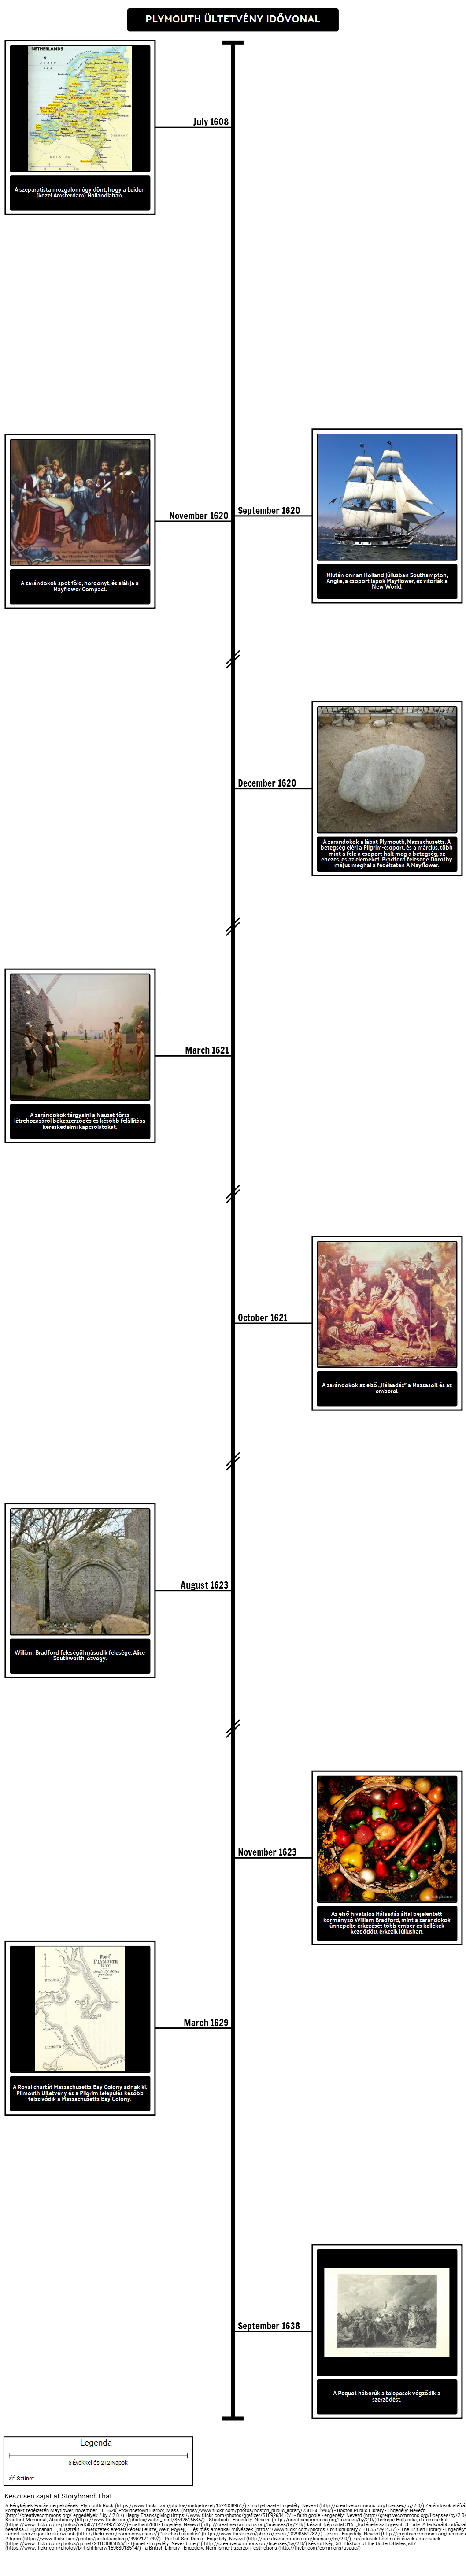 Plymouth Plantation Timeline